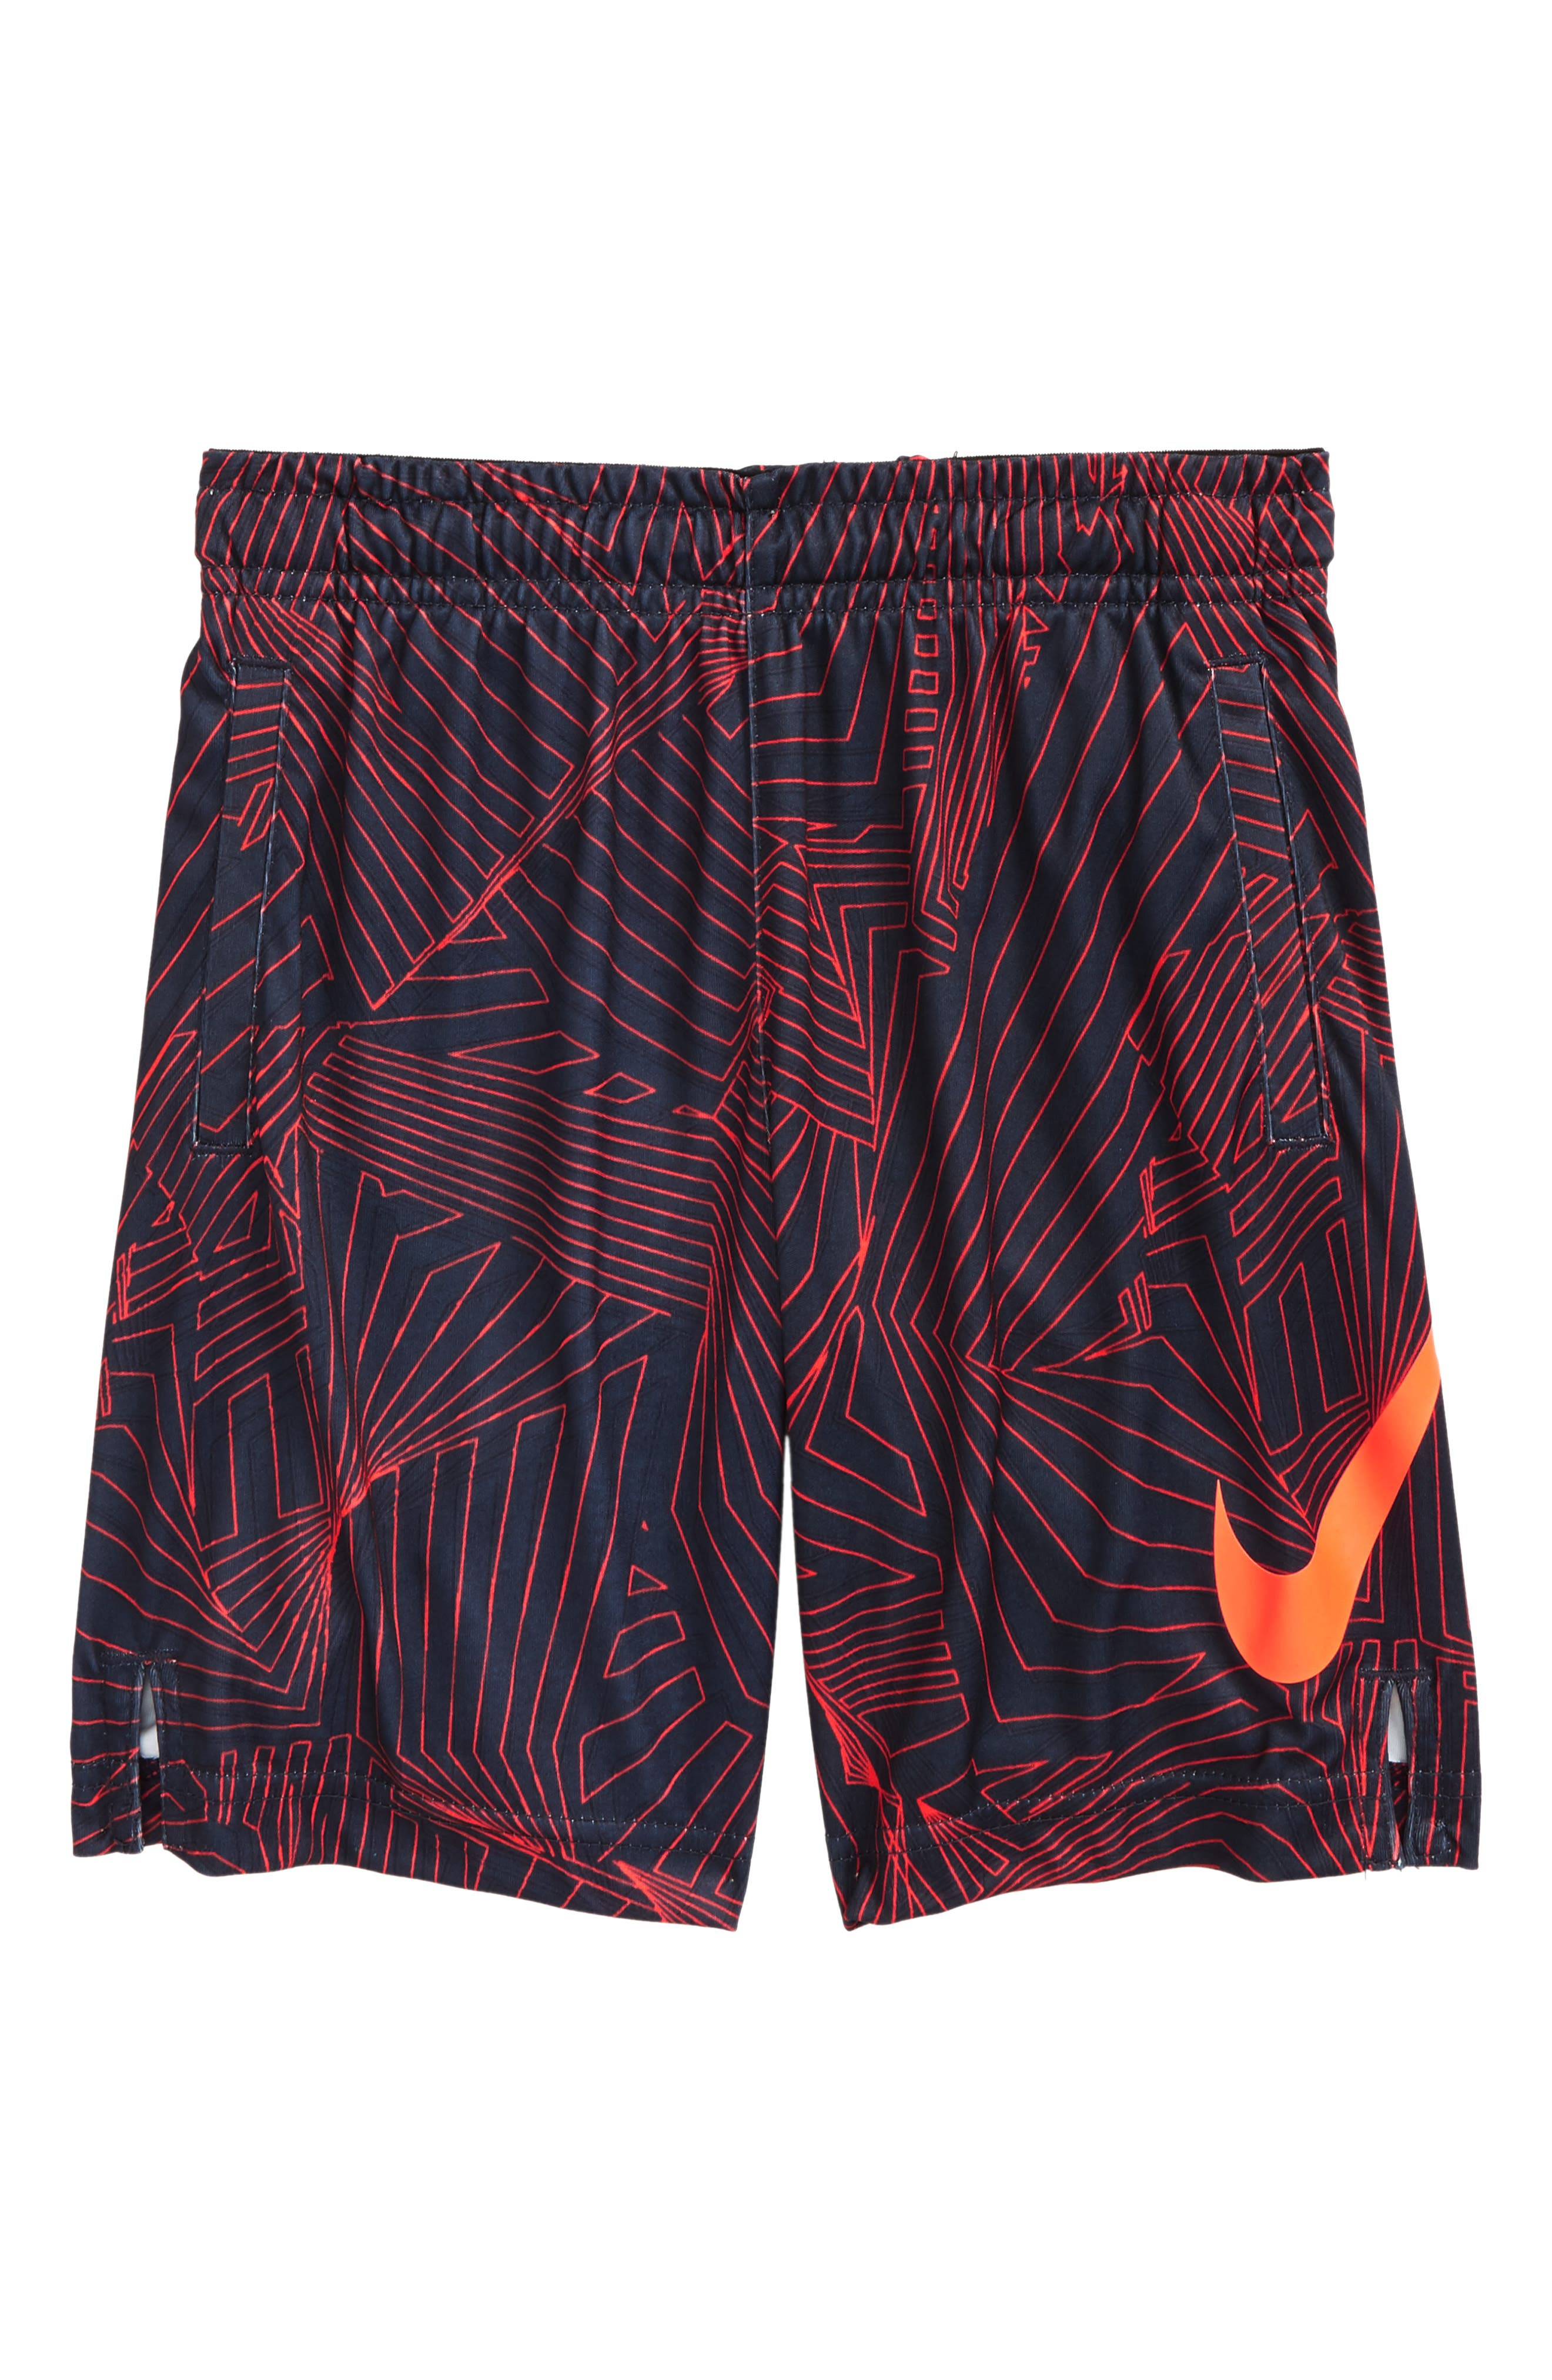 AOP Dry Shorts,                         Main,                         color, Thunder Blue